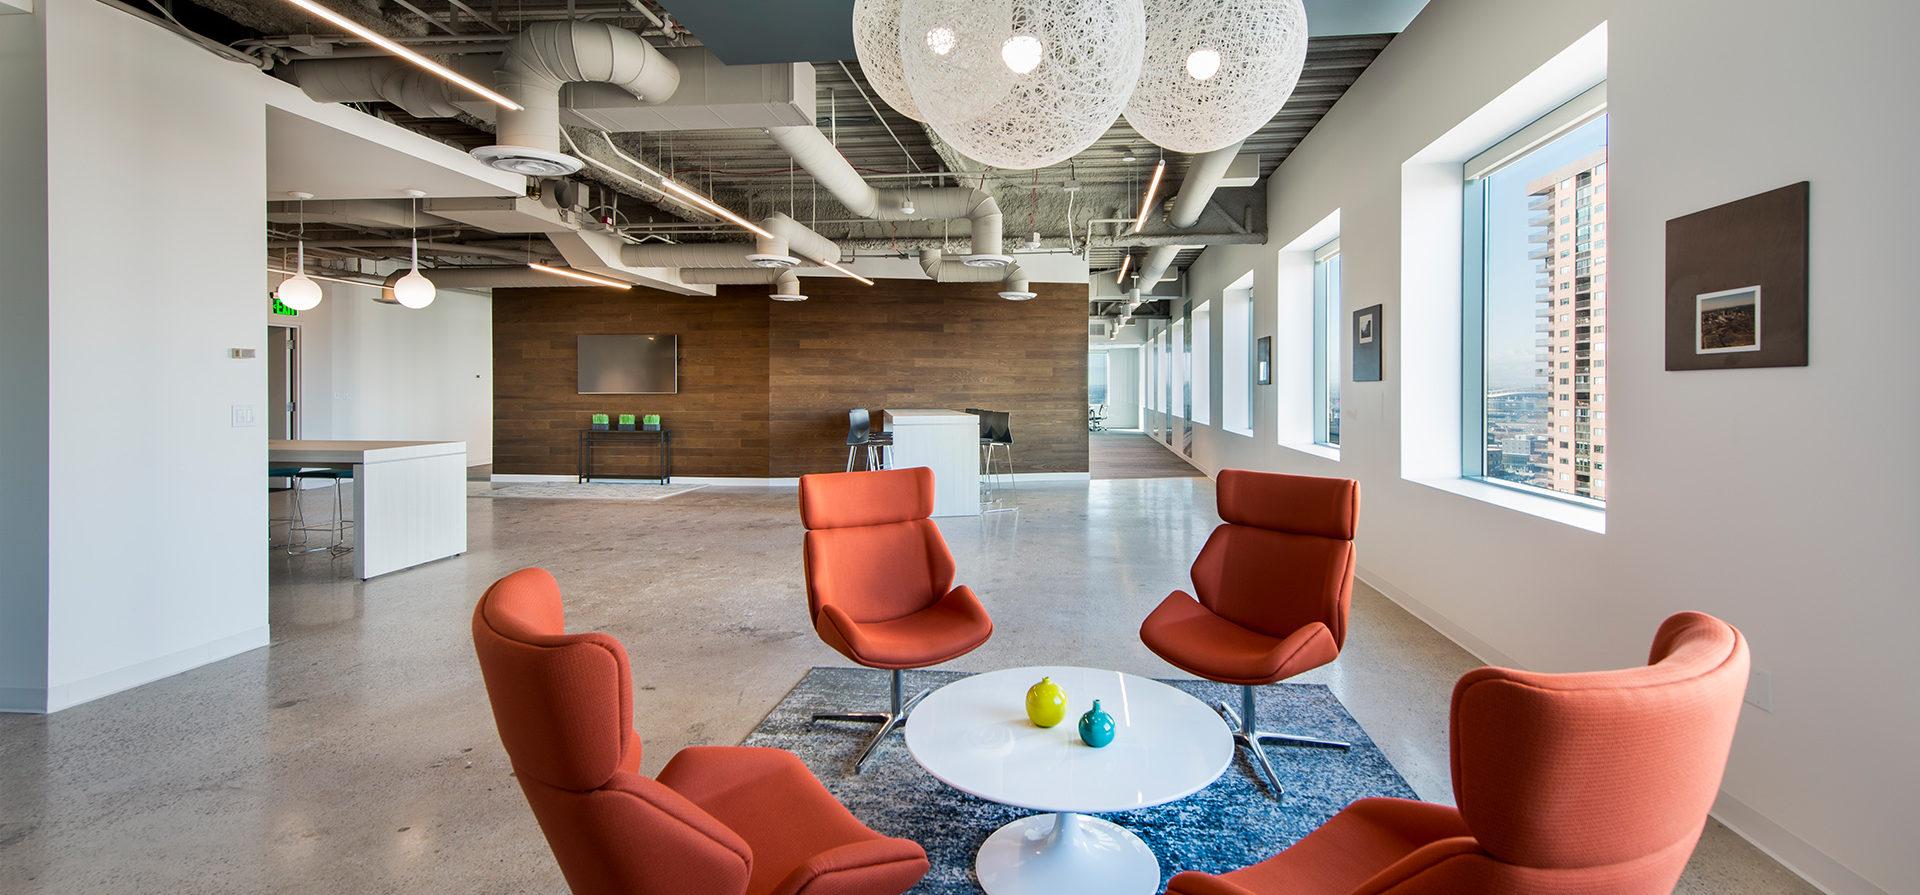 Callahan Model Suites: High Tech Prospect